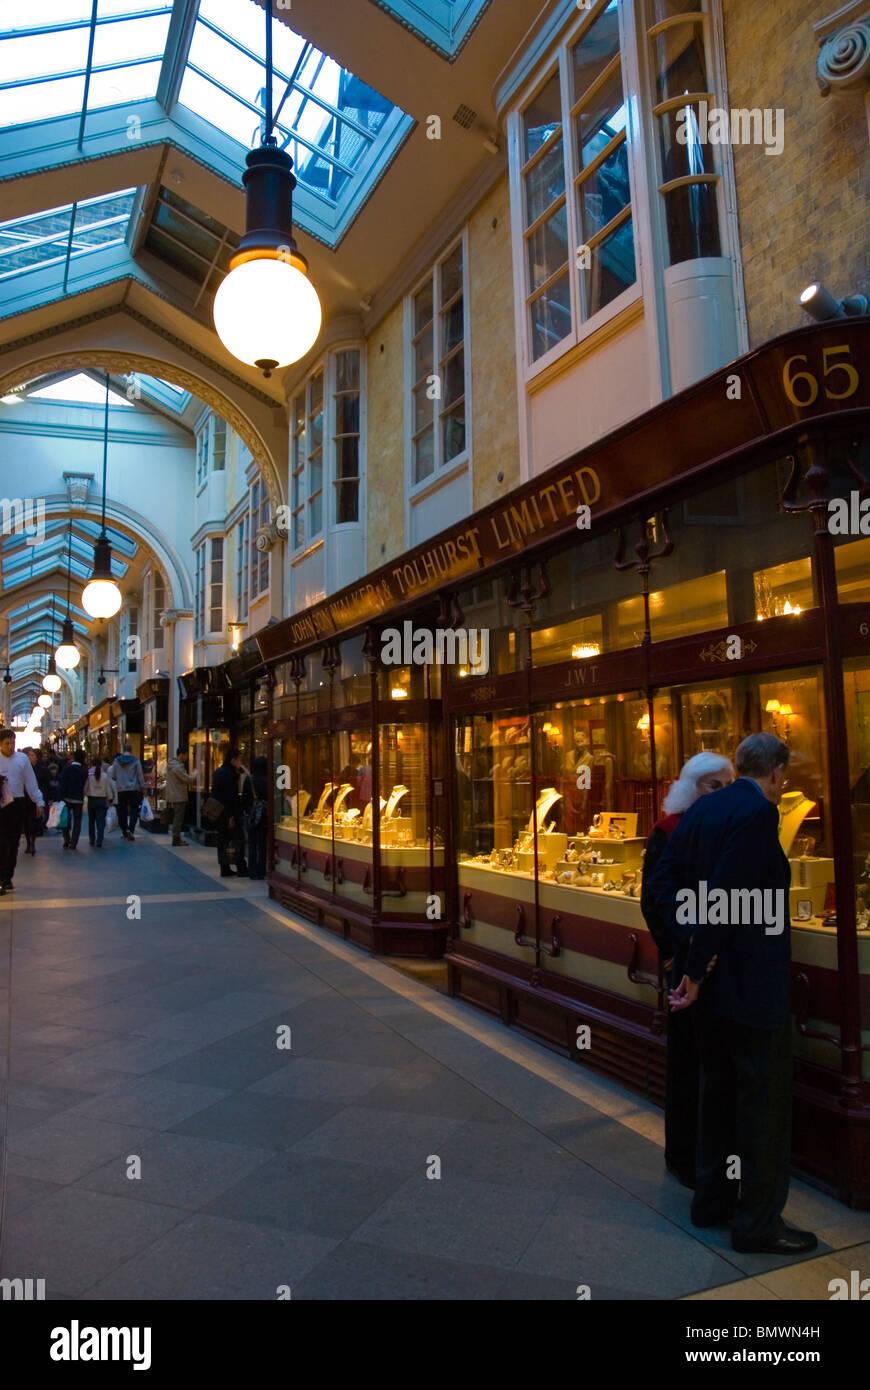 Burlington arcade Mayfair central London England UK - Stock Image